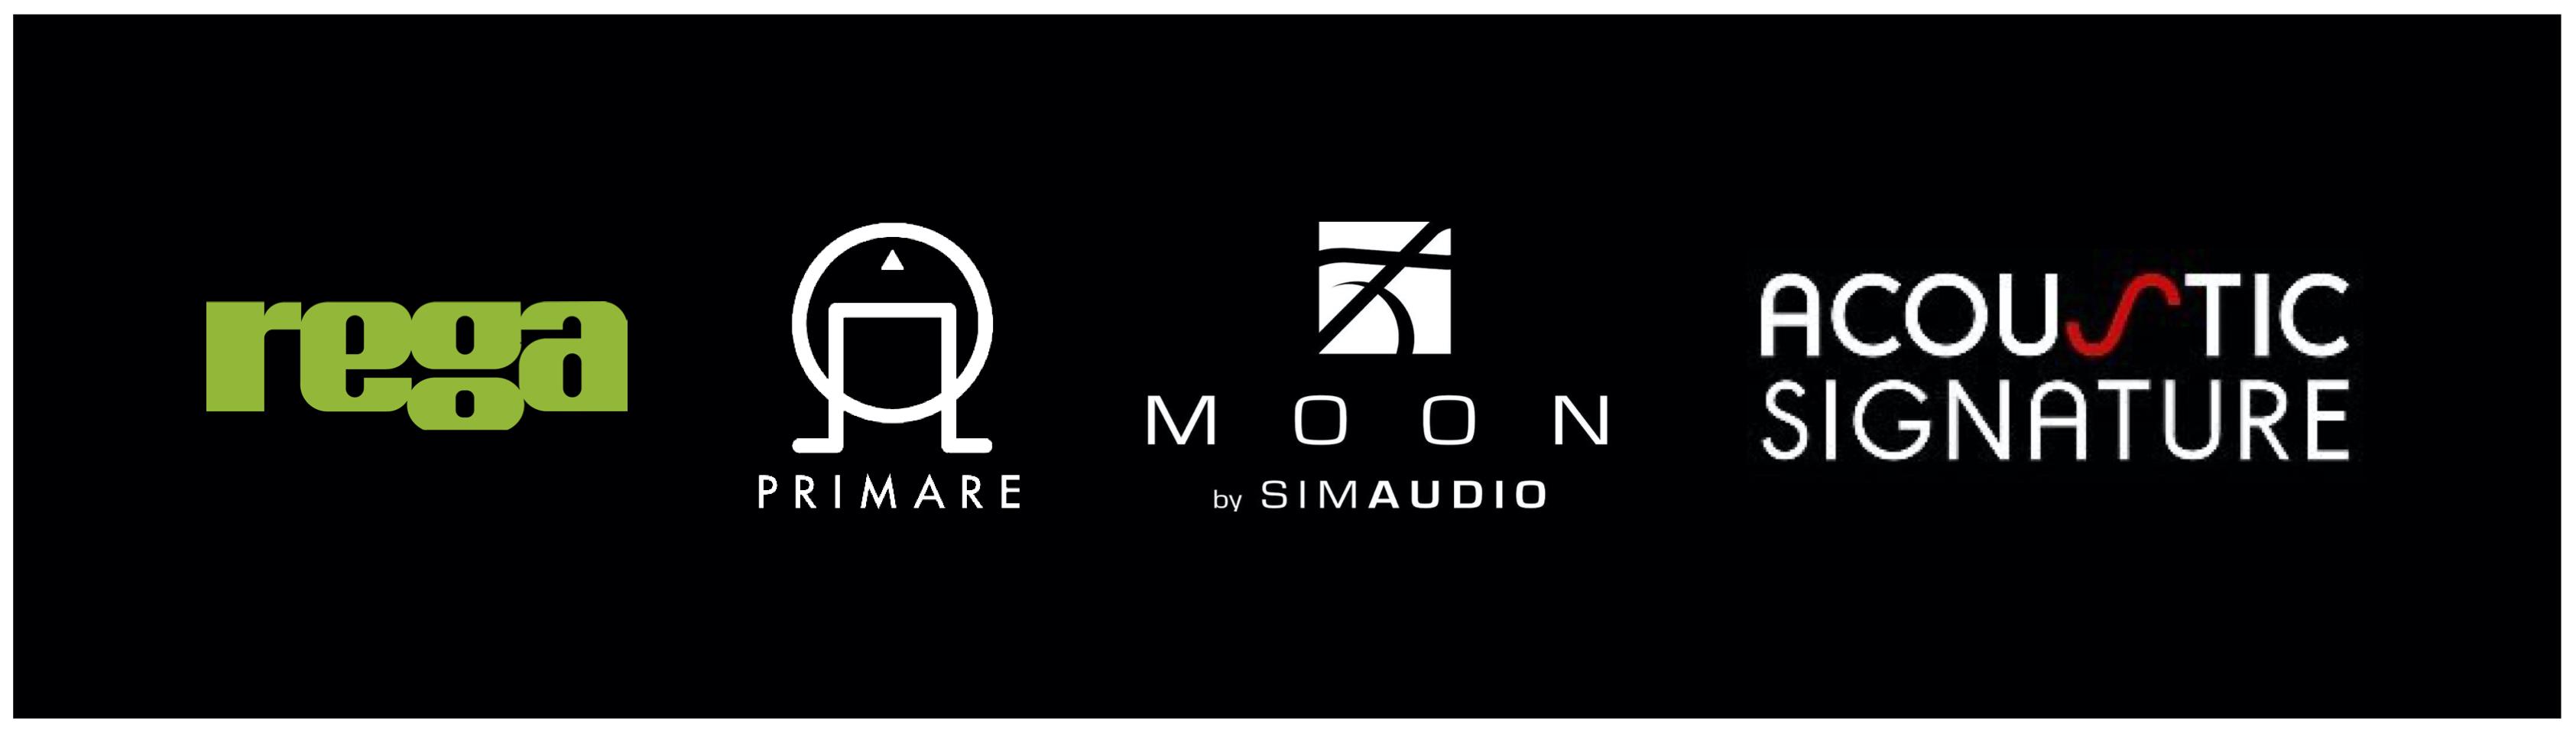 brands-the-listening-suite-5.jpg